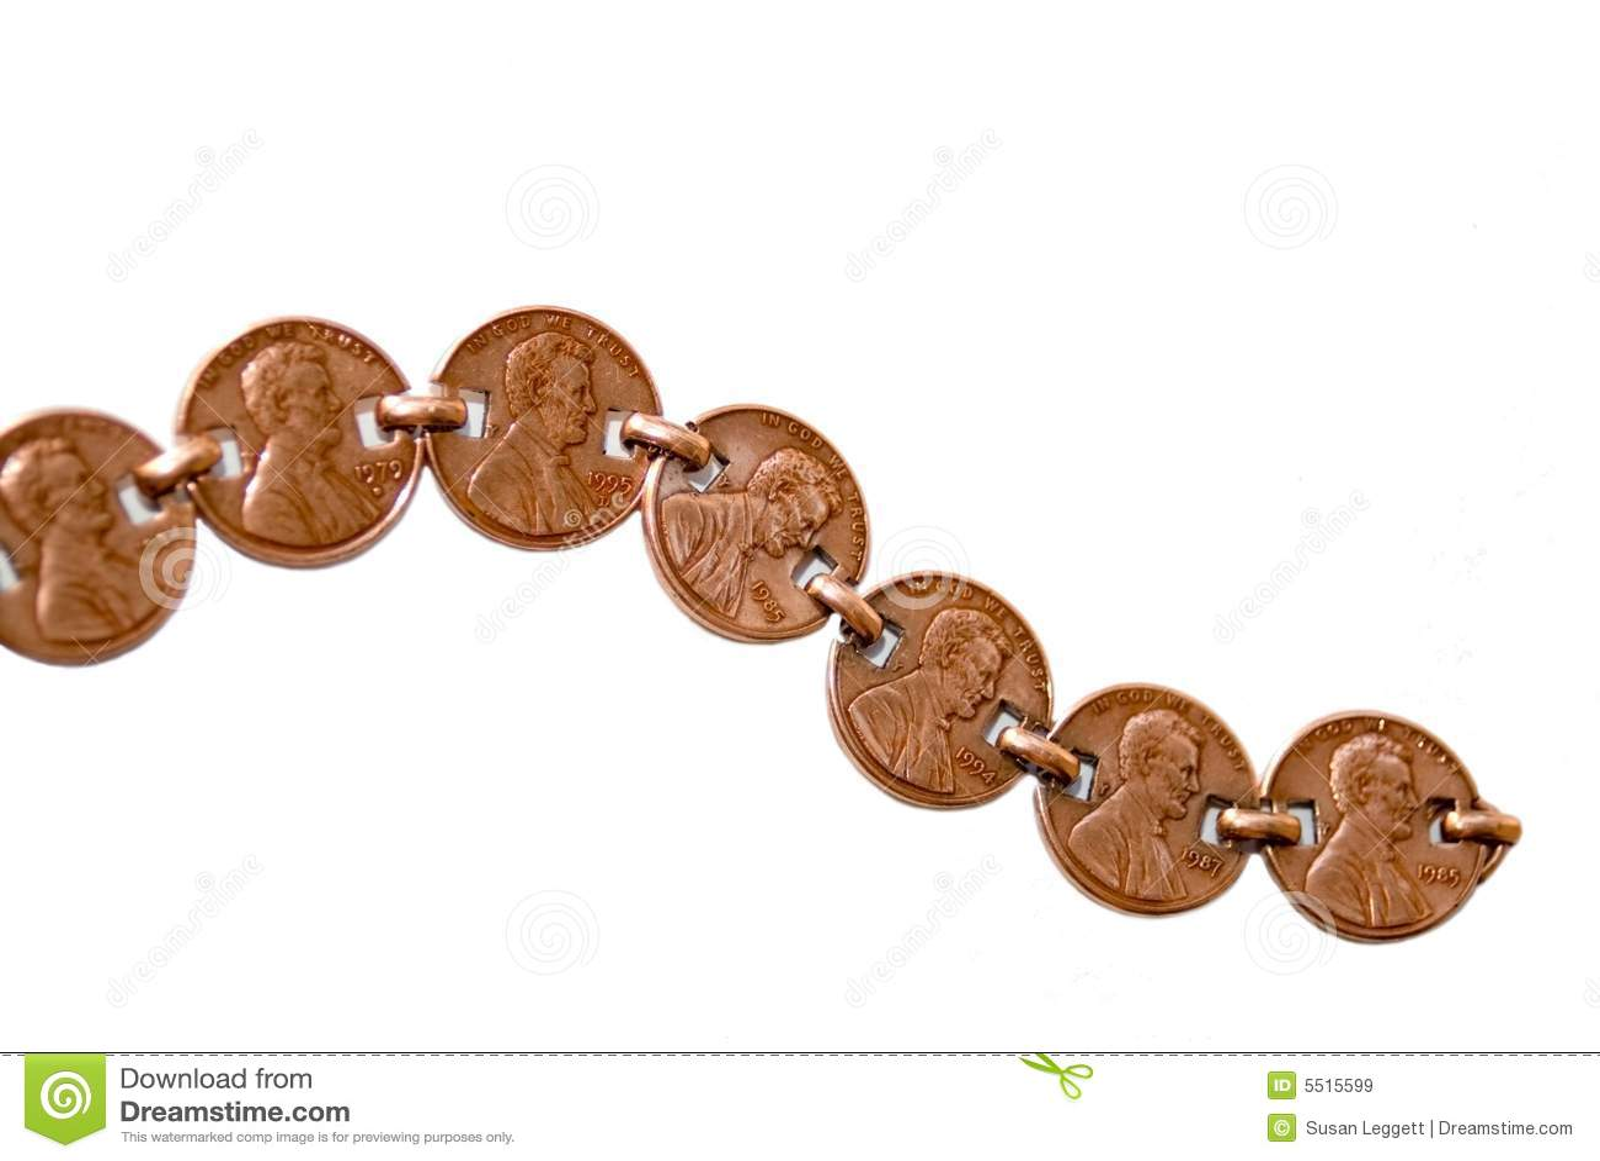 String of Pennies